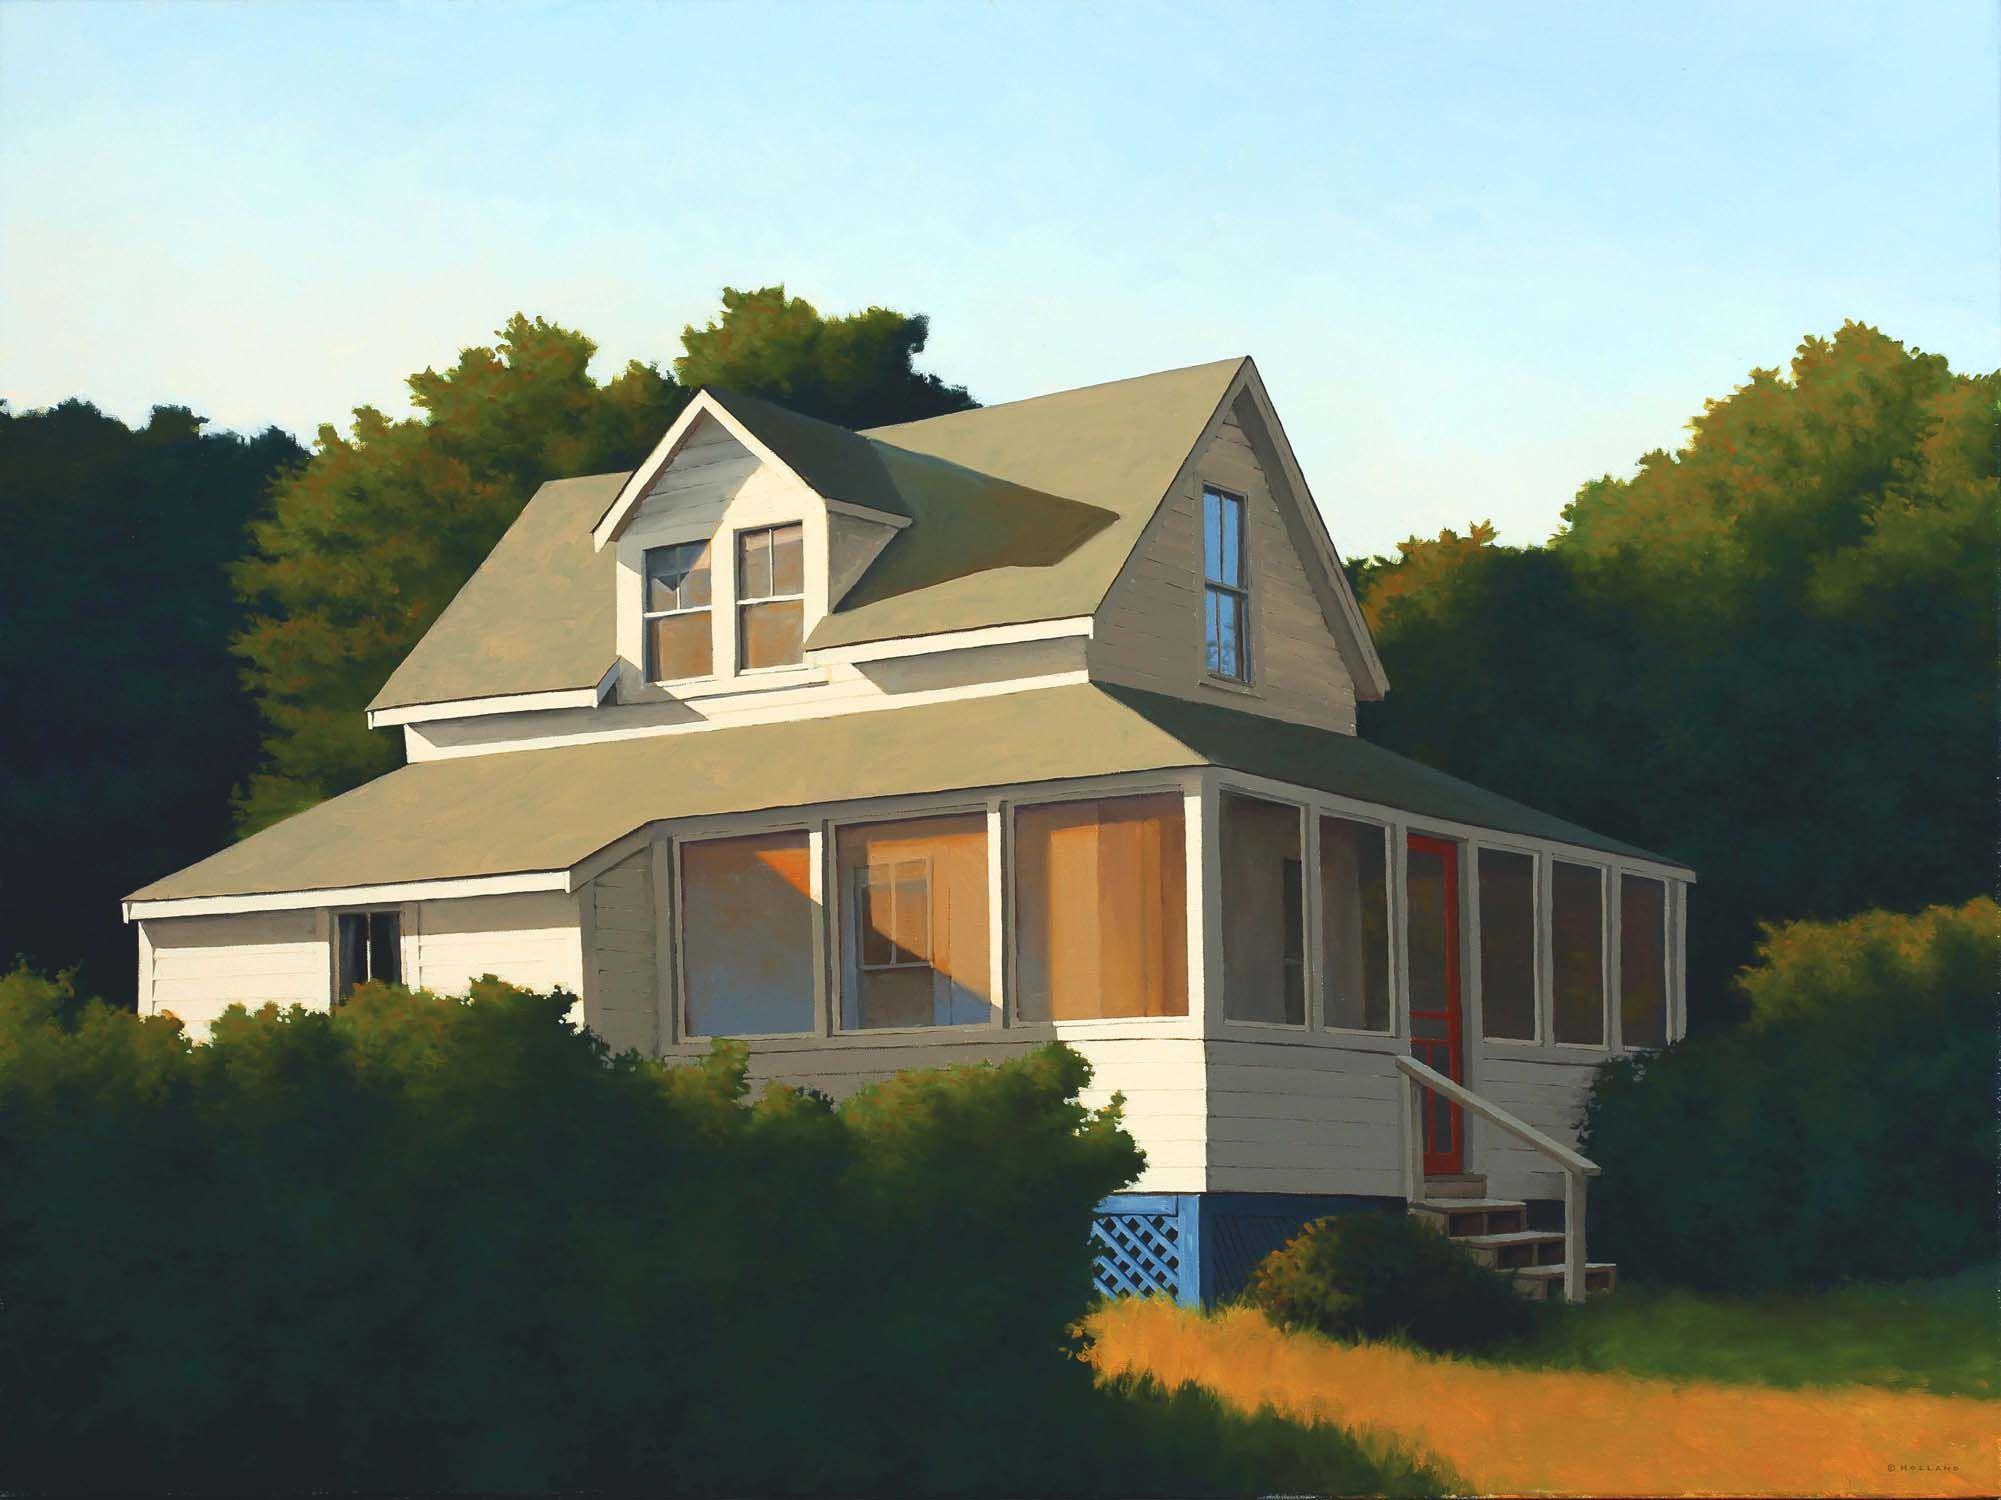 jim holland 1955 present american artist wraparound porch